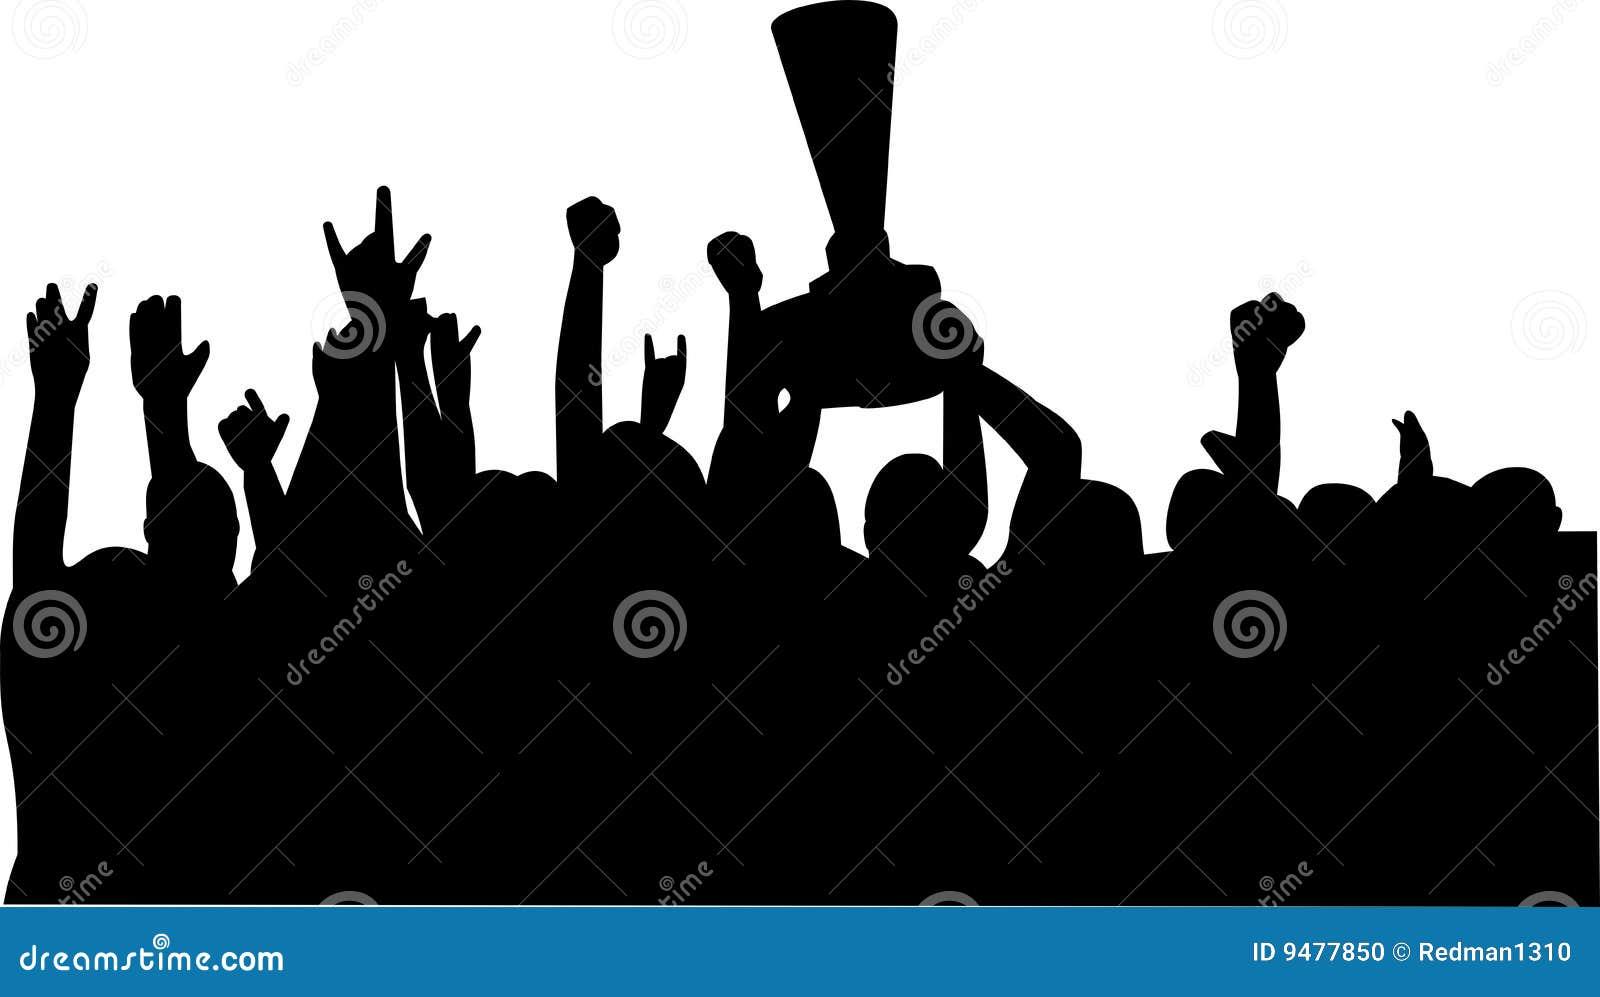 Championship Team Celebration Stock Photo - Image: 9477850